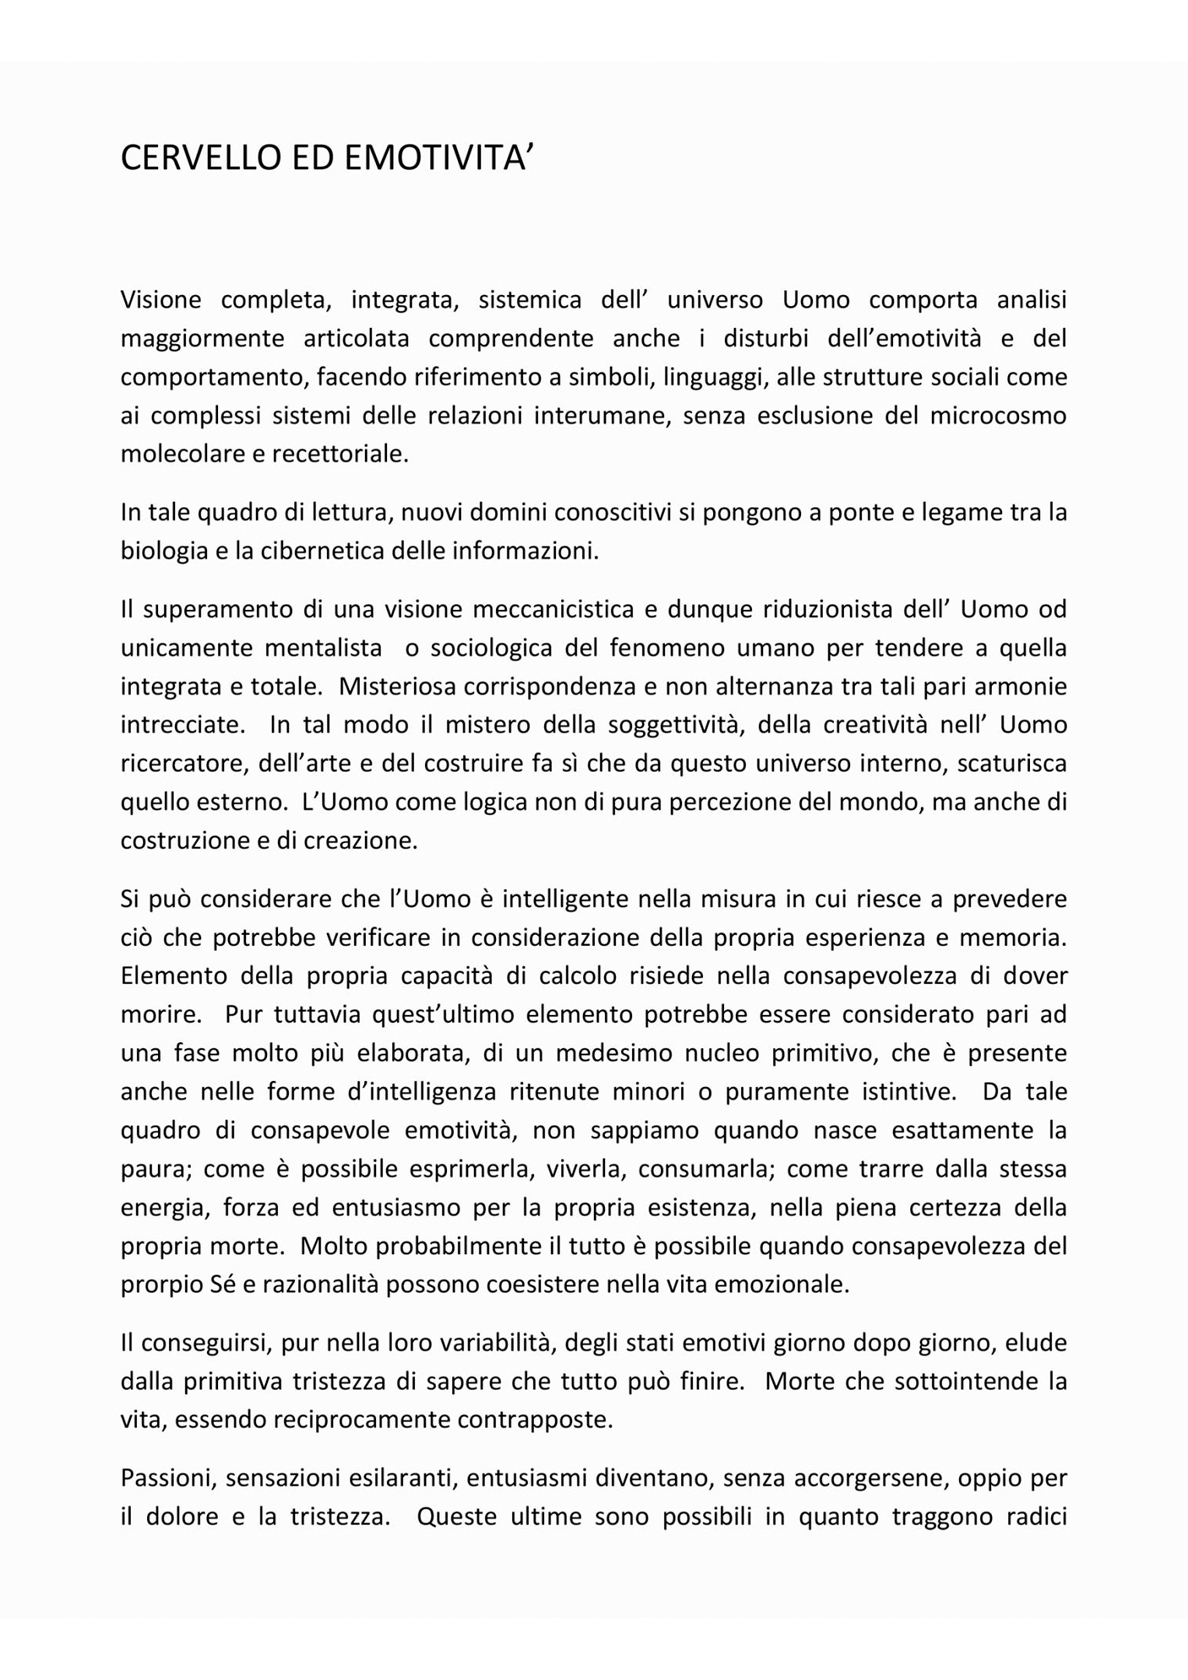 CERVELLO ED EMOTIVITÀ